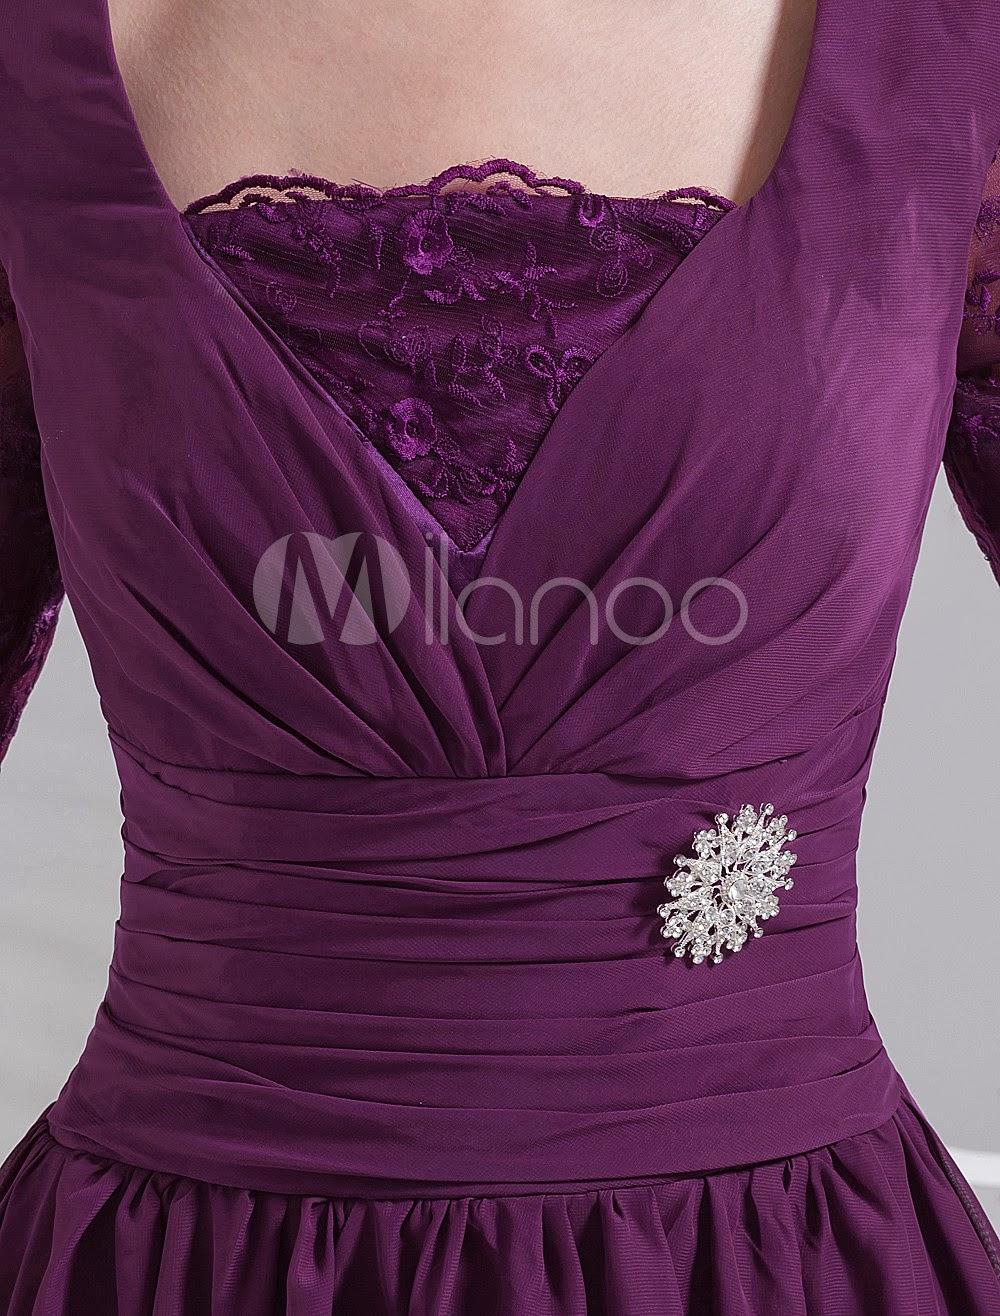 China Wholesale Clothes - Grape Square Neck Half Sleeves Knee Length Chiffon Prom Dresses